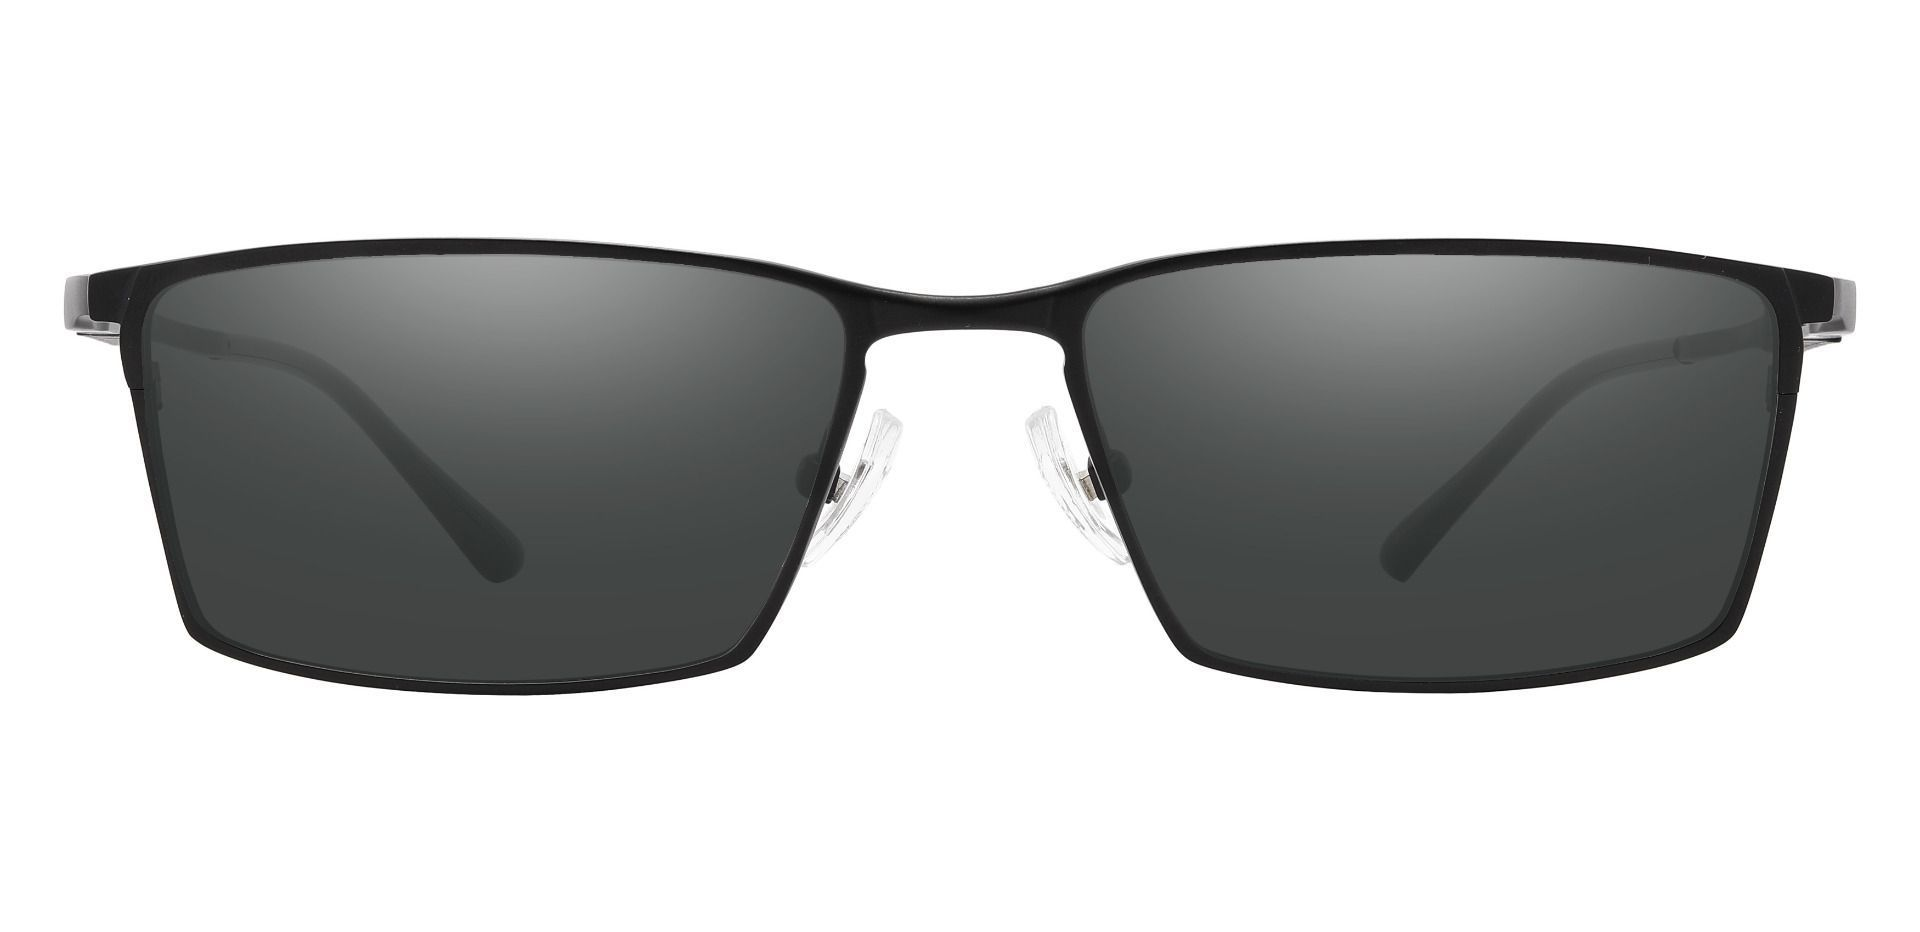 Elmore Rectangle Prescription Sunglasses - Black Frame With Gray Lenses